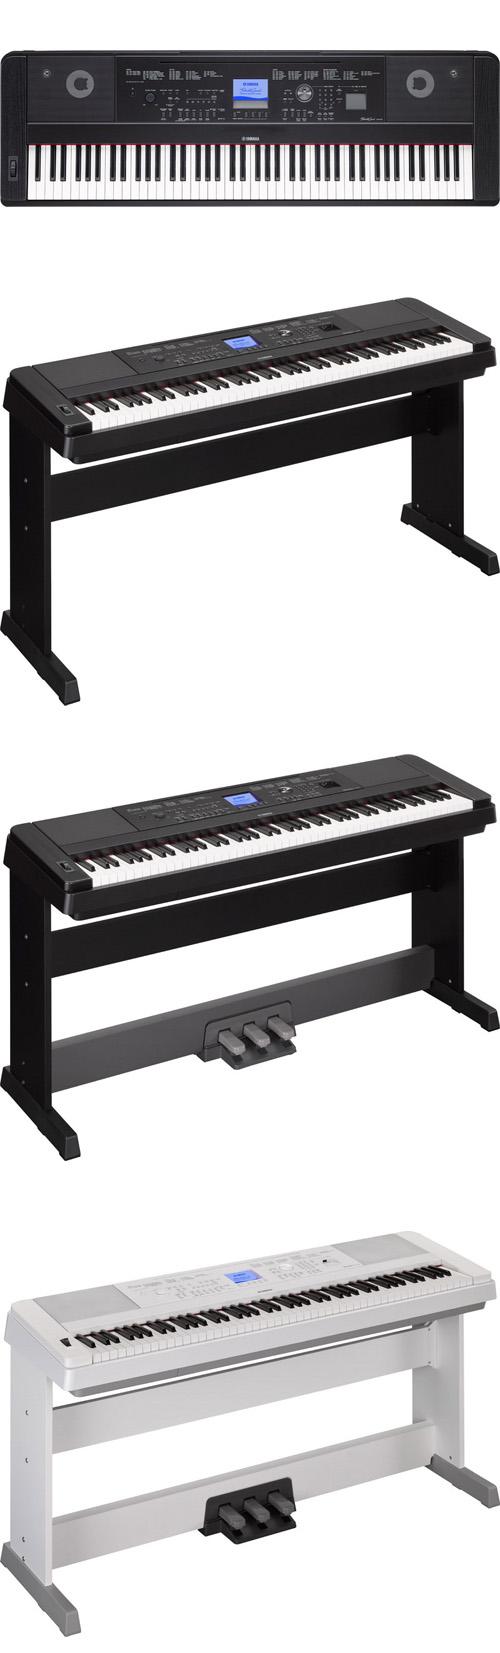 Ofertas en pianos digitales yamaha rinc n musical for Yamaha dgx 660 manual